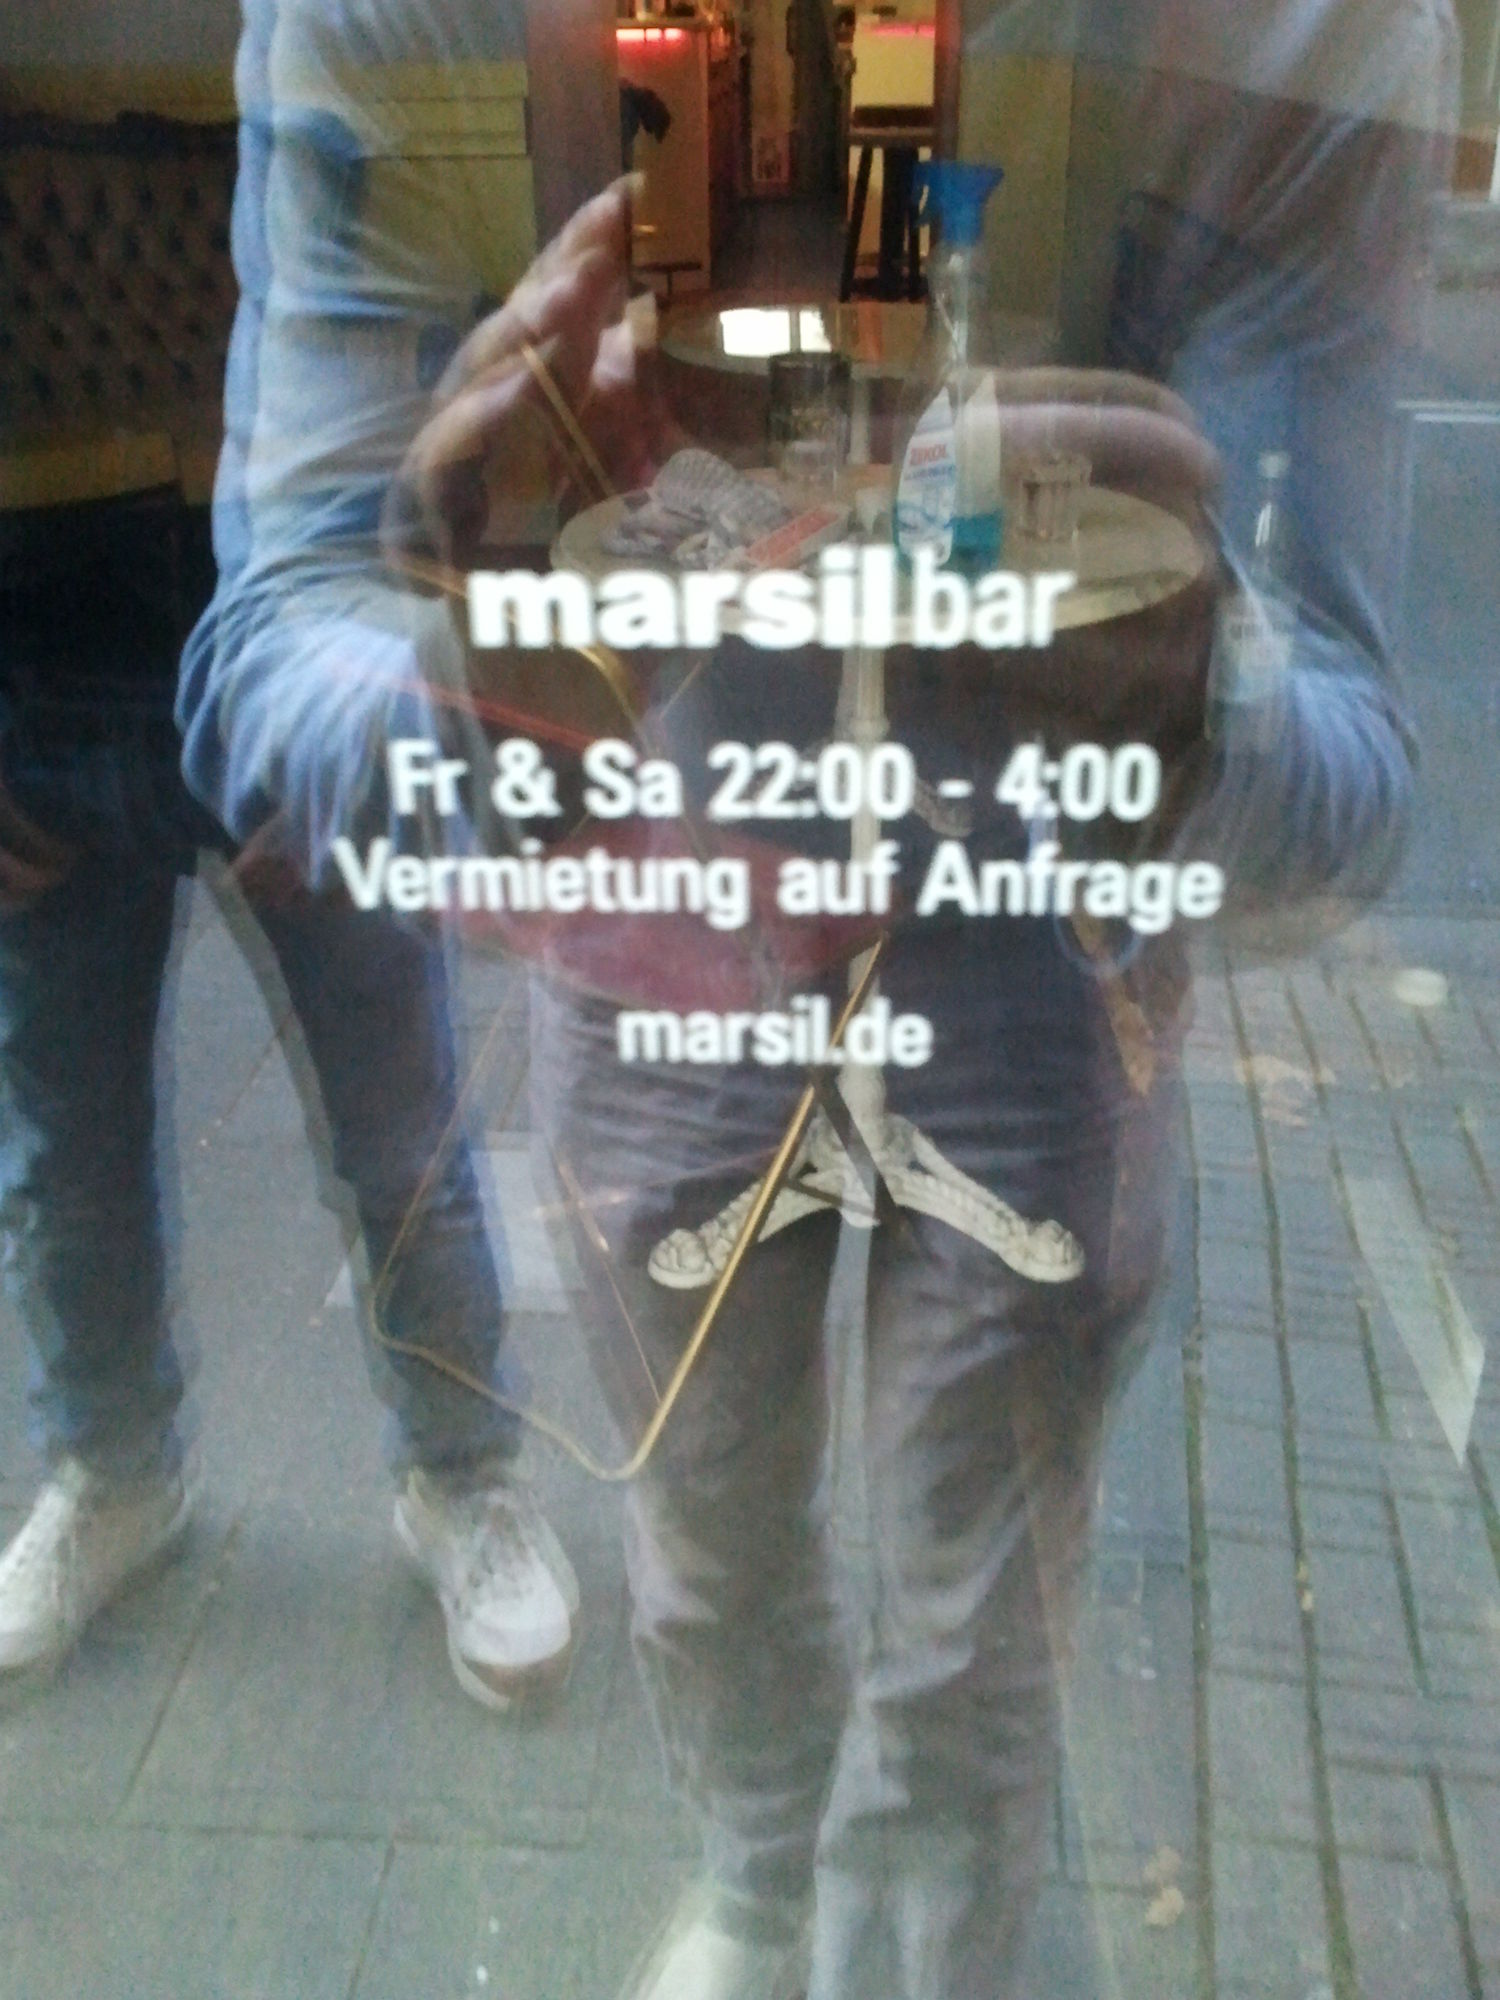 GOSEE : MARSIL - Hotel und Bar